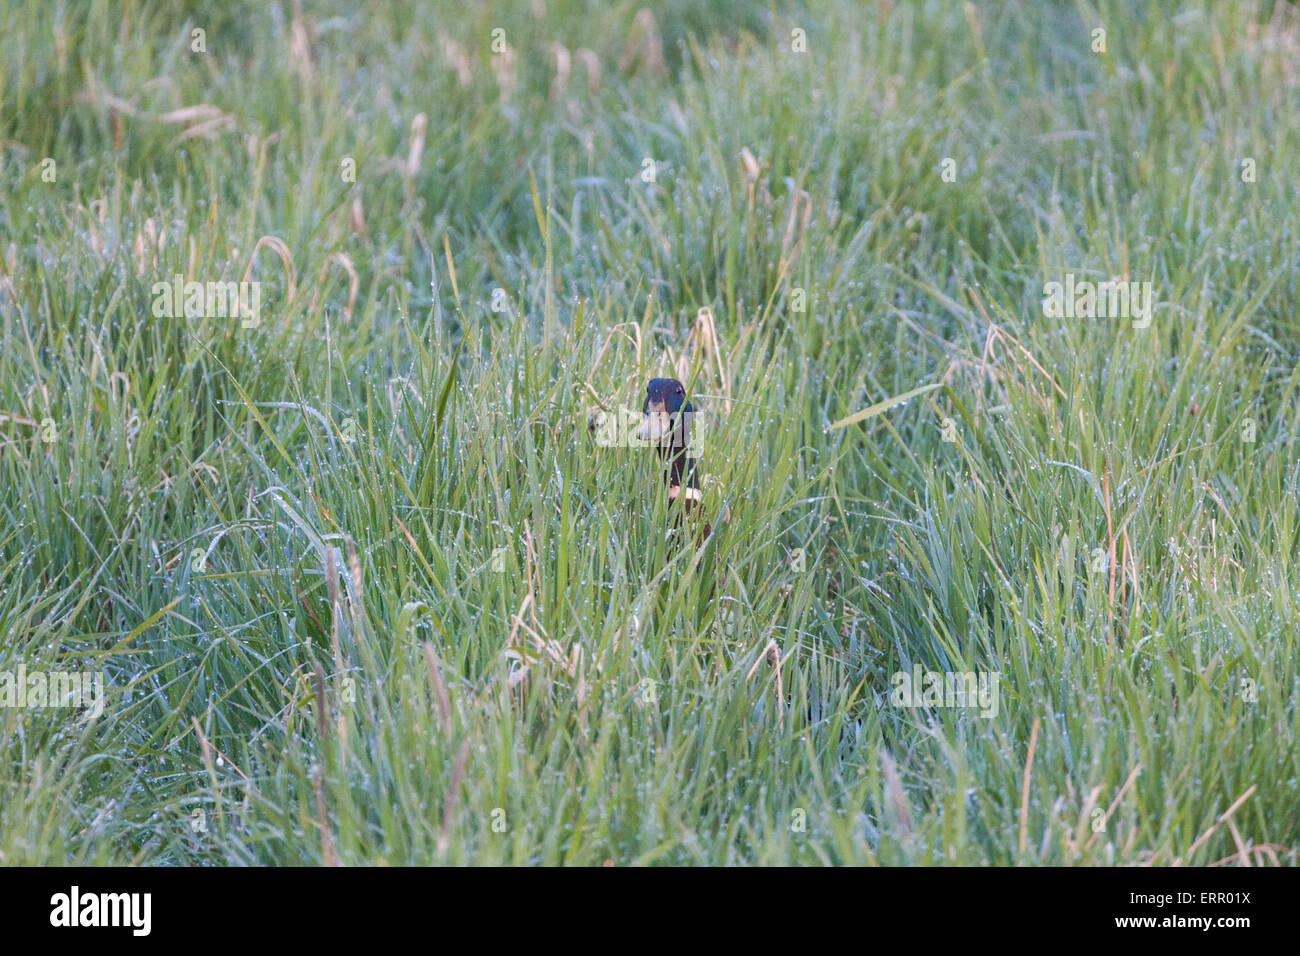 Canard colvert mâle, Anas platyrhynchos, peeking dans à l'appareil photo dans l'herbe avec des Photo Stock